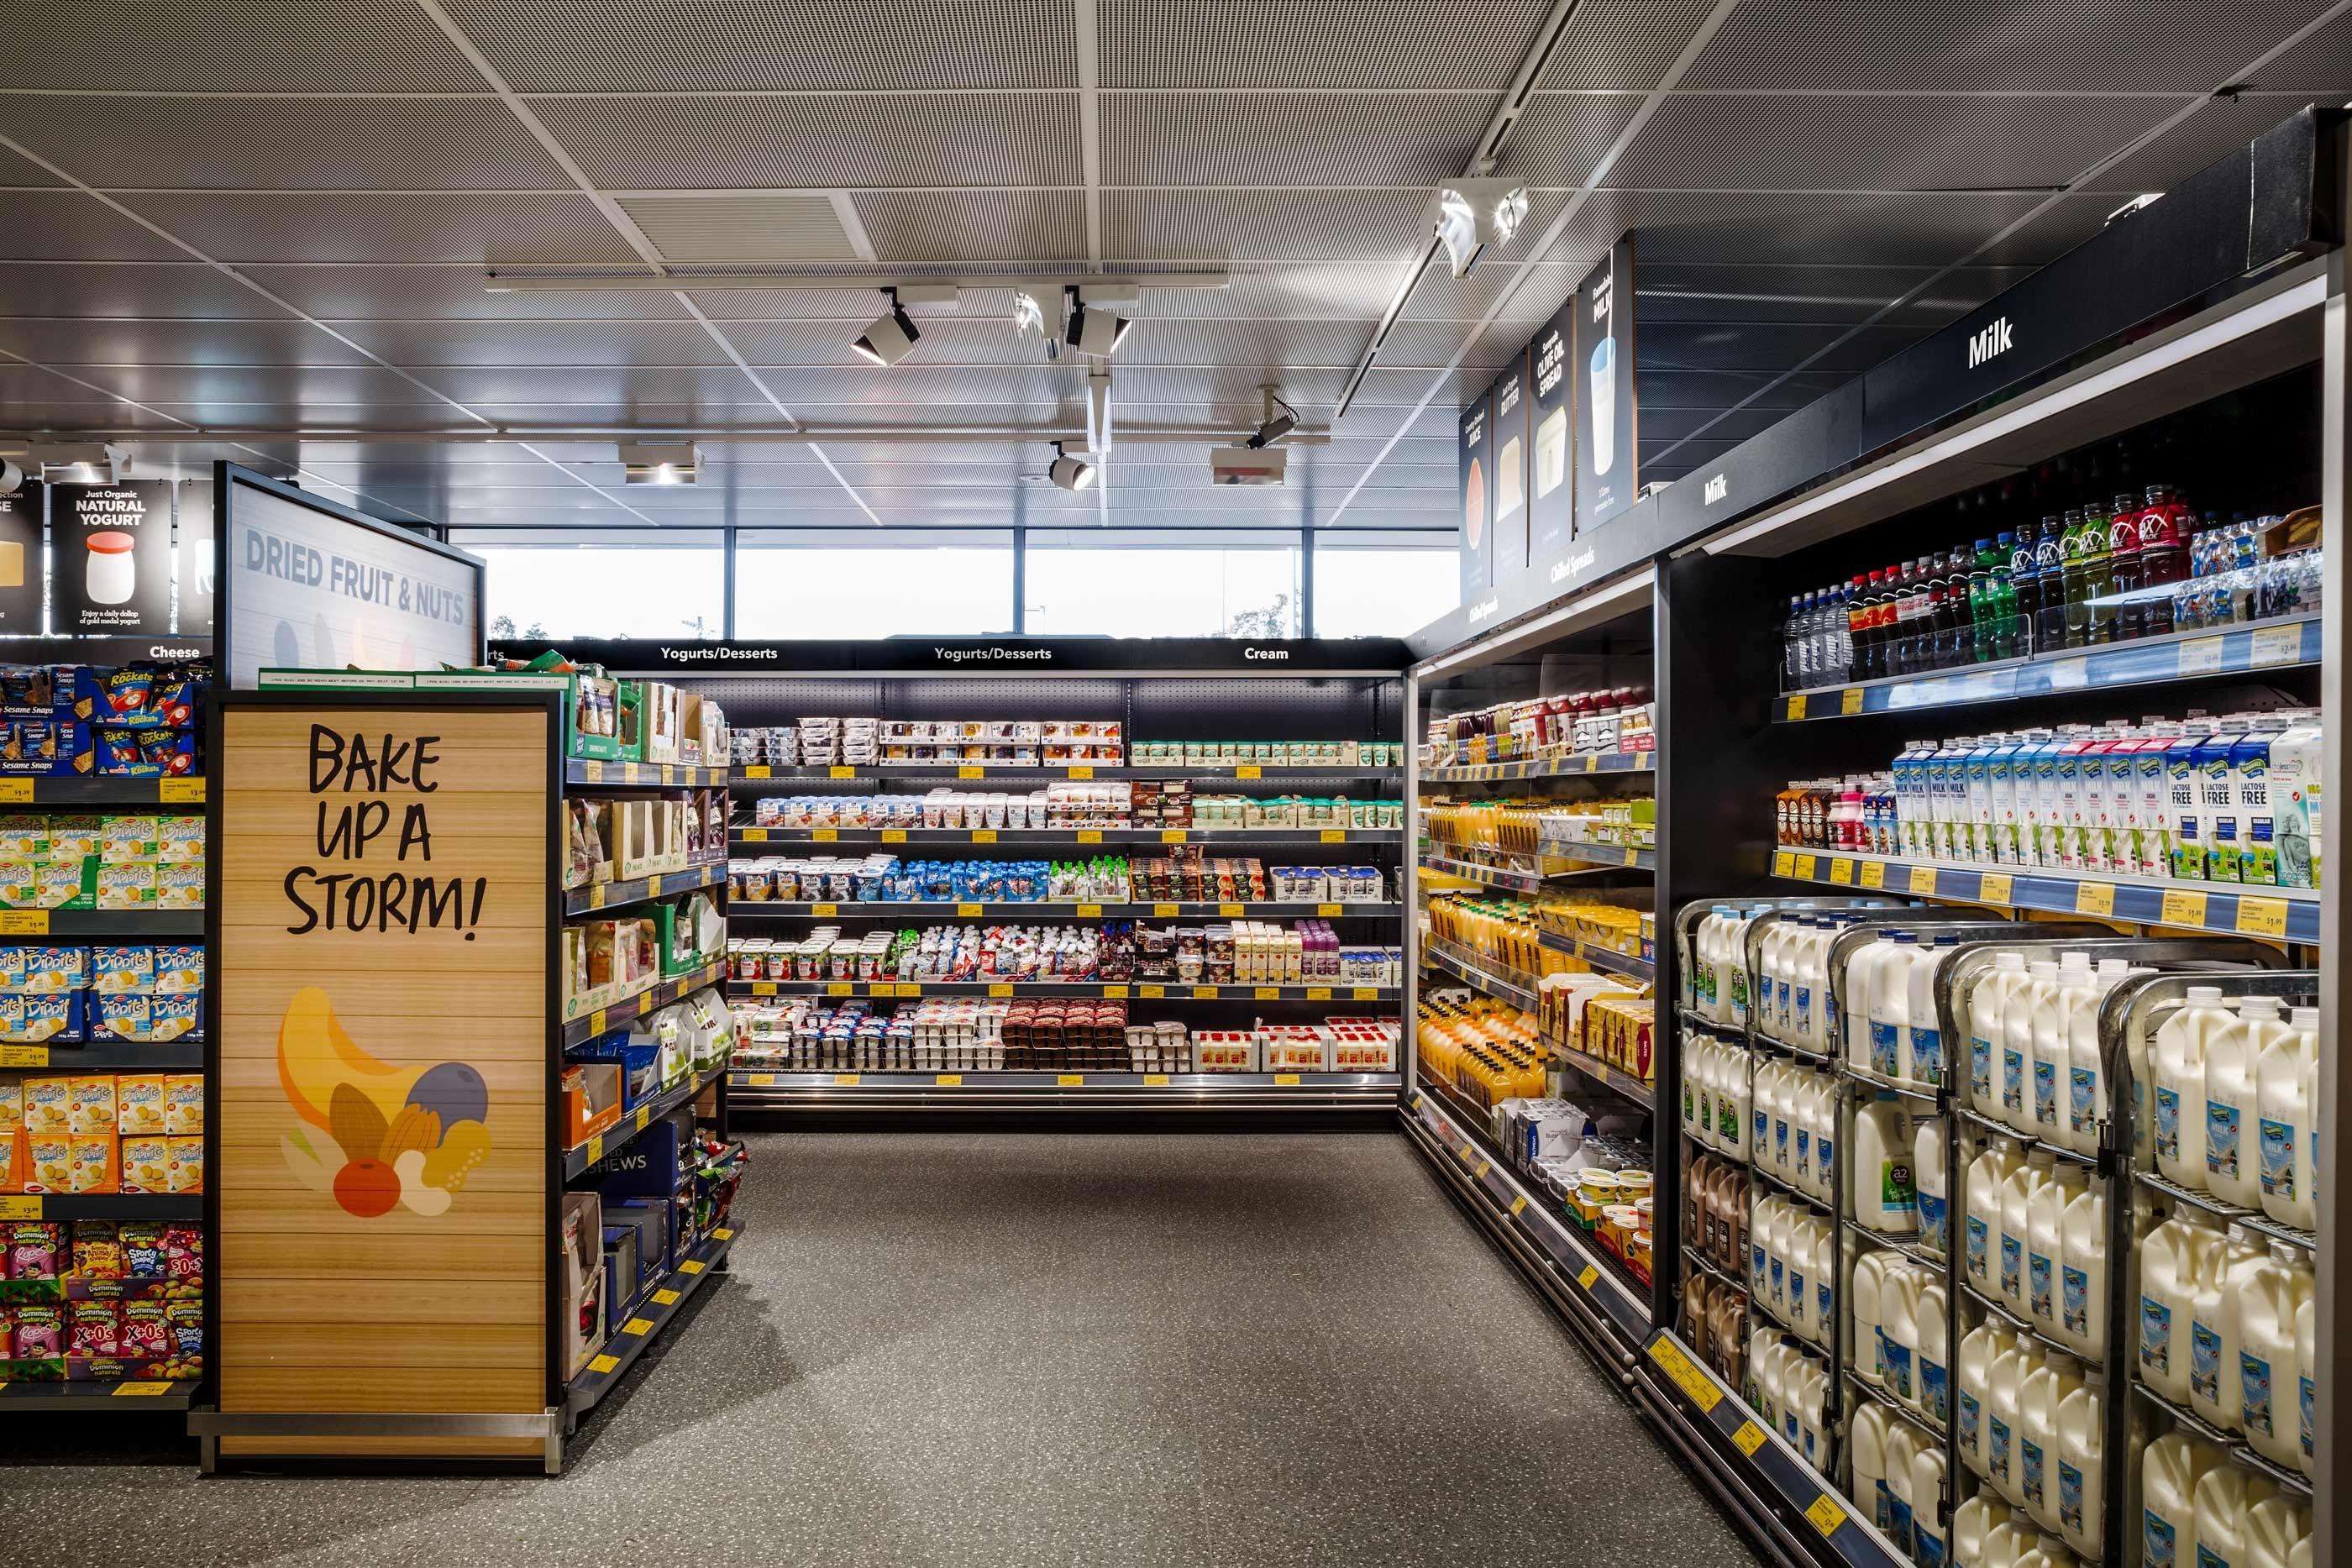 Aldi tries new strategy to grow bigger market share in Australia